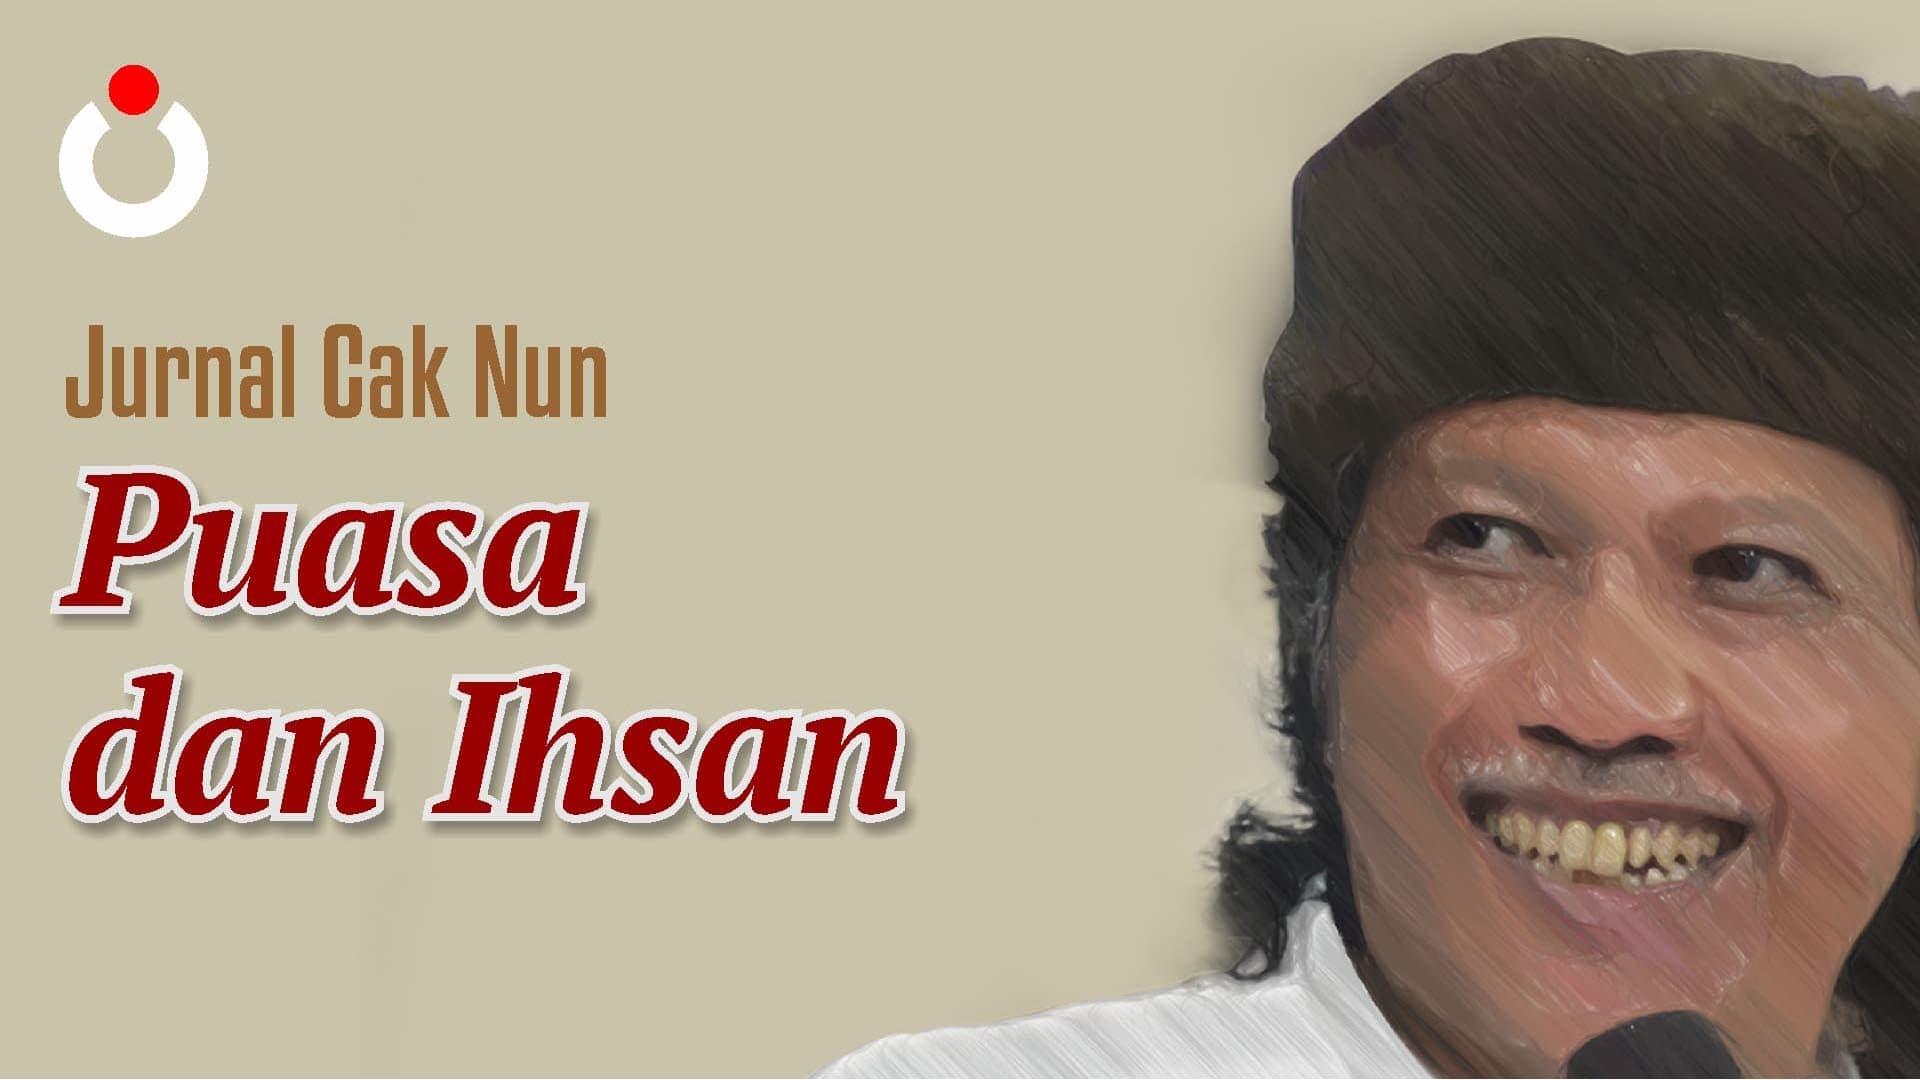 Jurnal Cak Nun – Puasa dan Ihsan